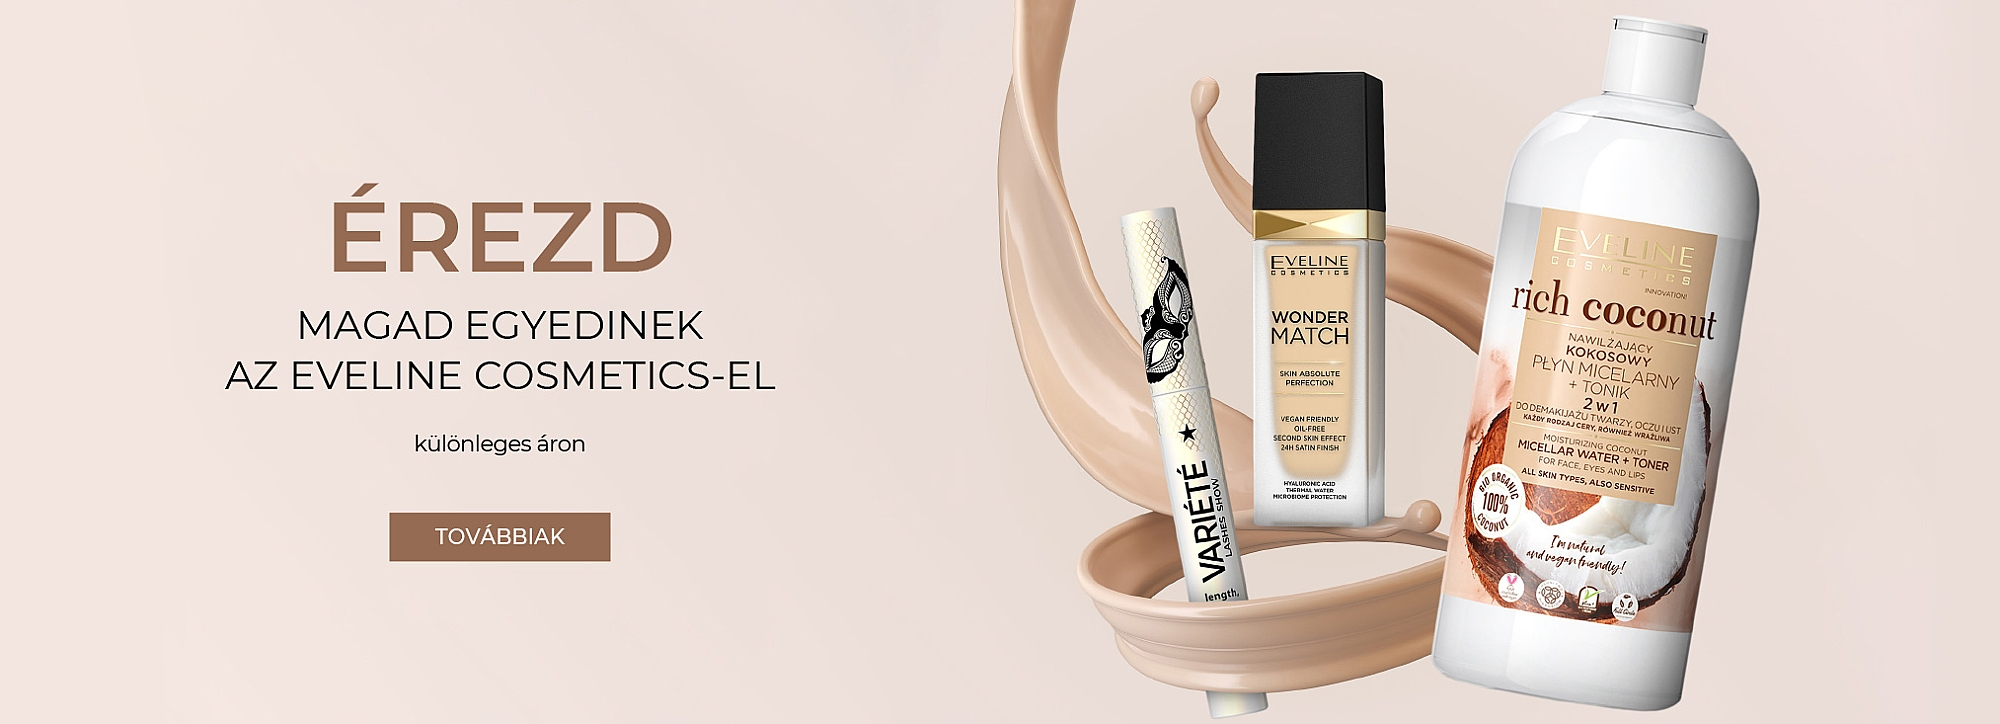 Eveline Cosmetics_makeup